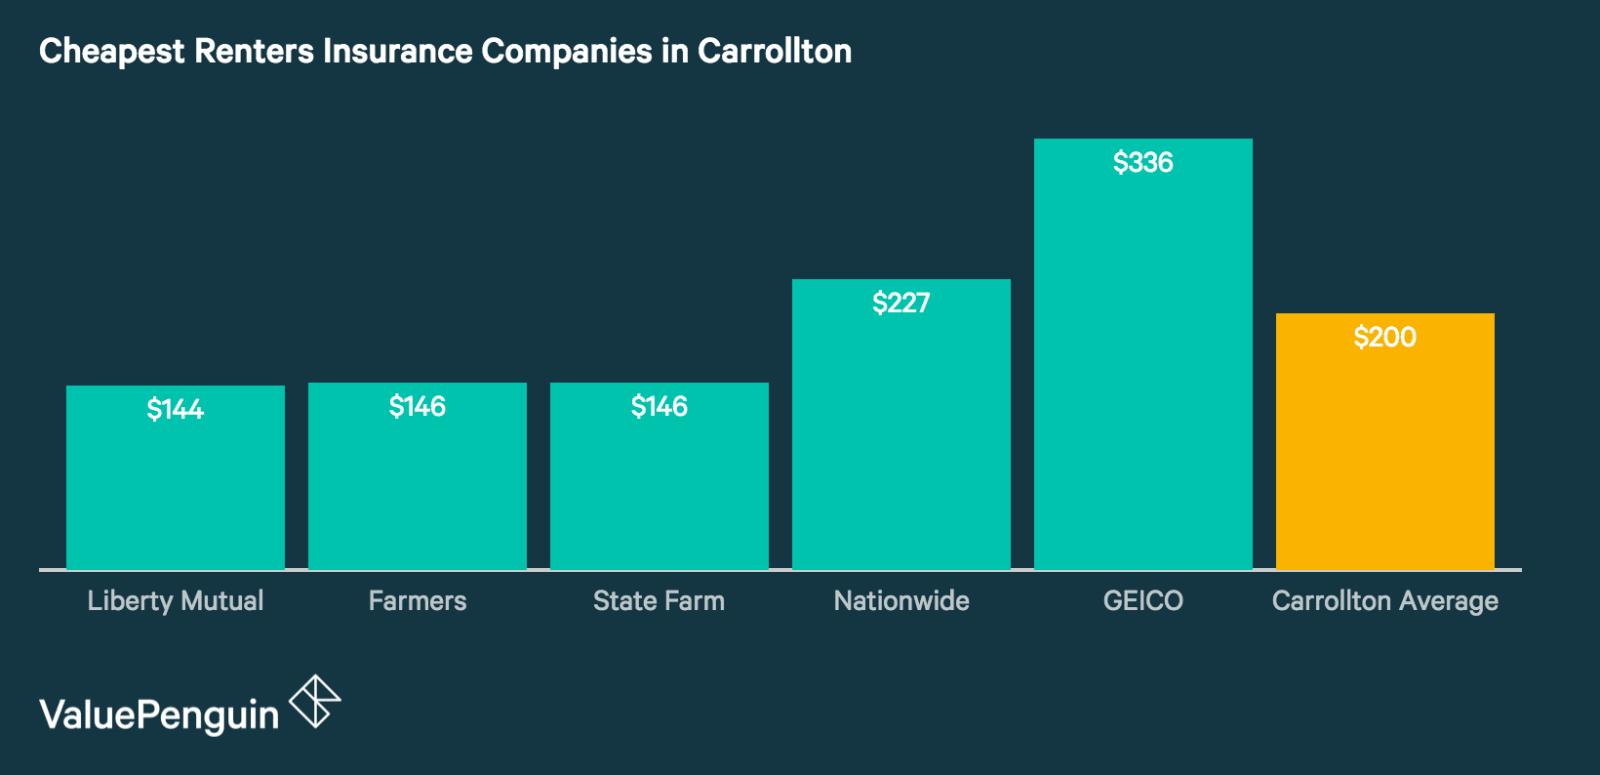 Cheap Renters Insurance in Carrollton